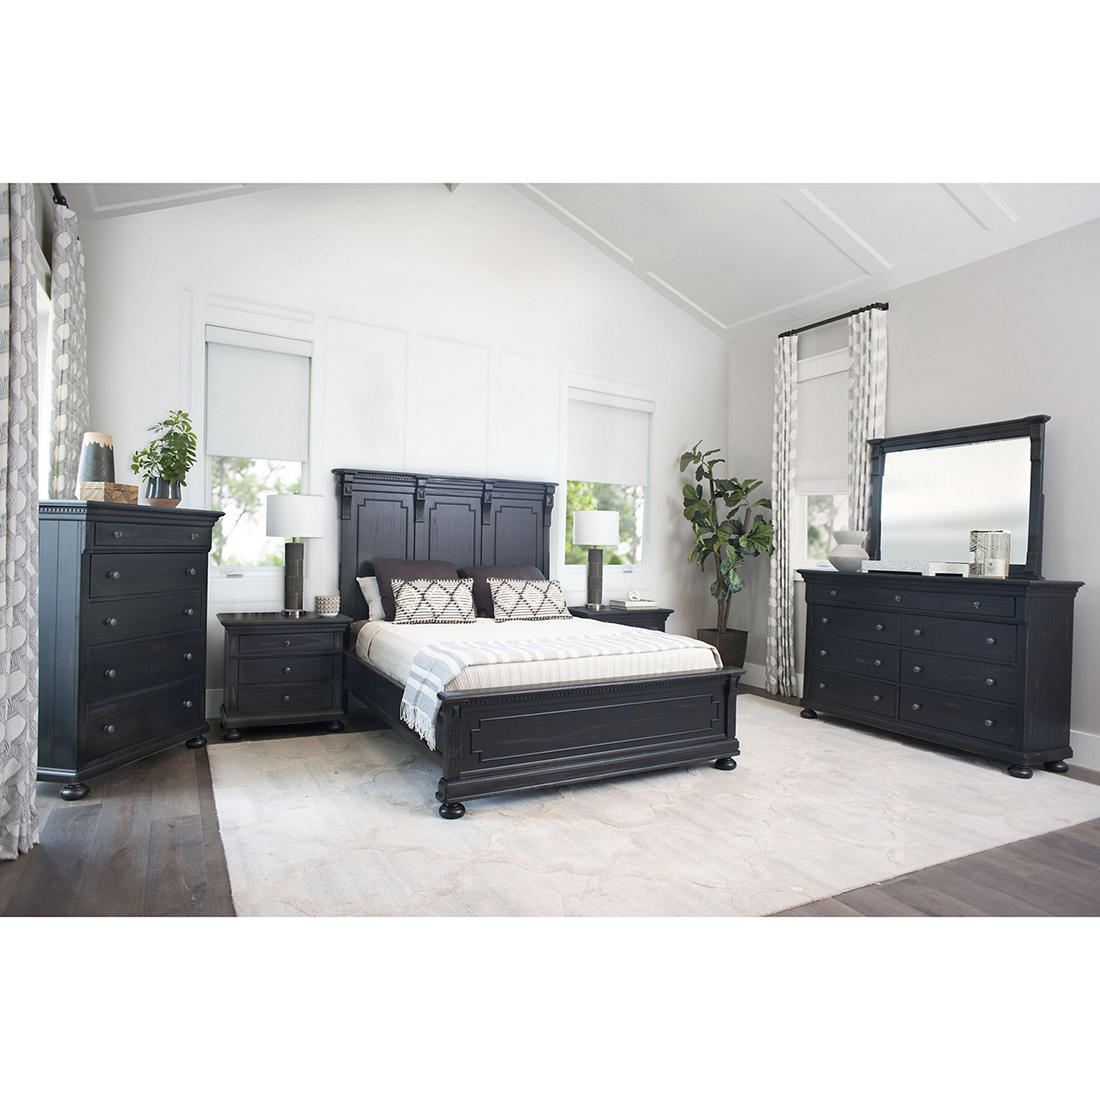 Abbyson Living Hartford 6 Pc King Size Bedroom Set Black